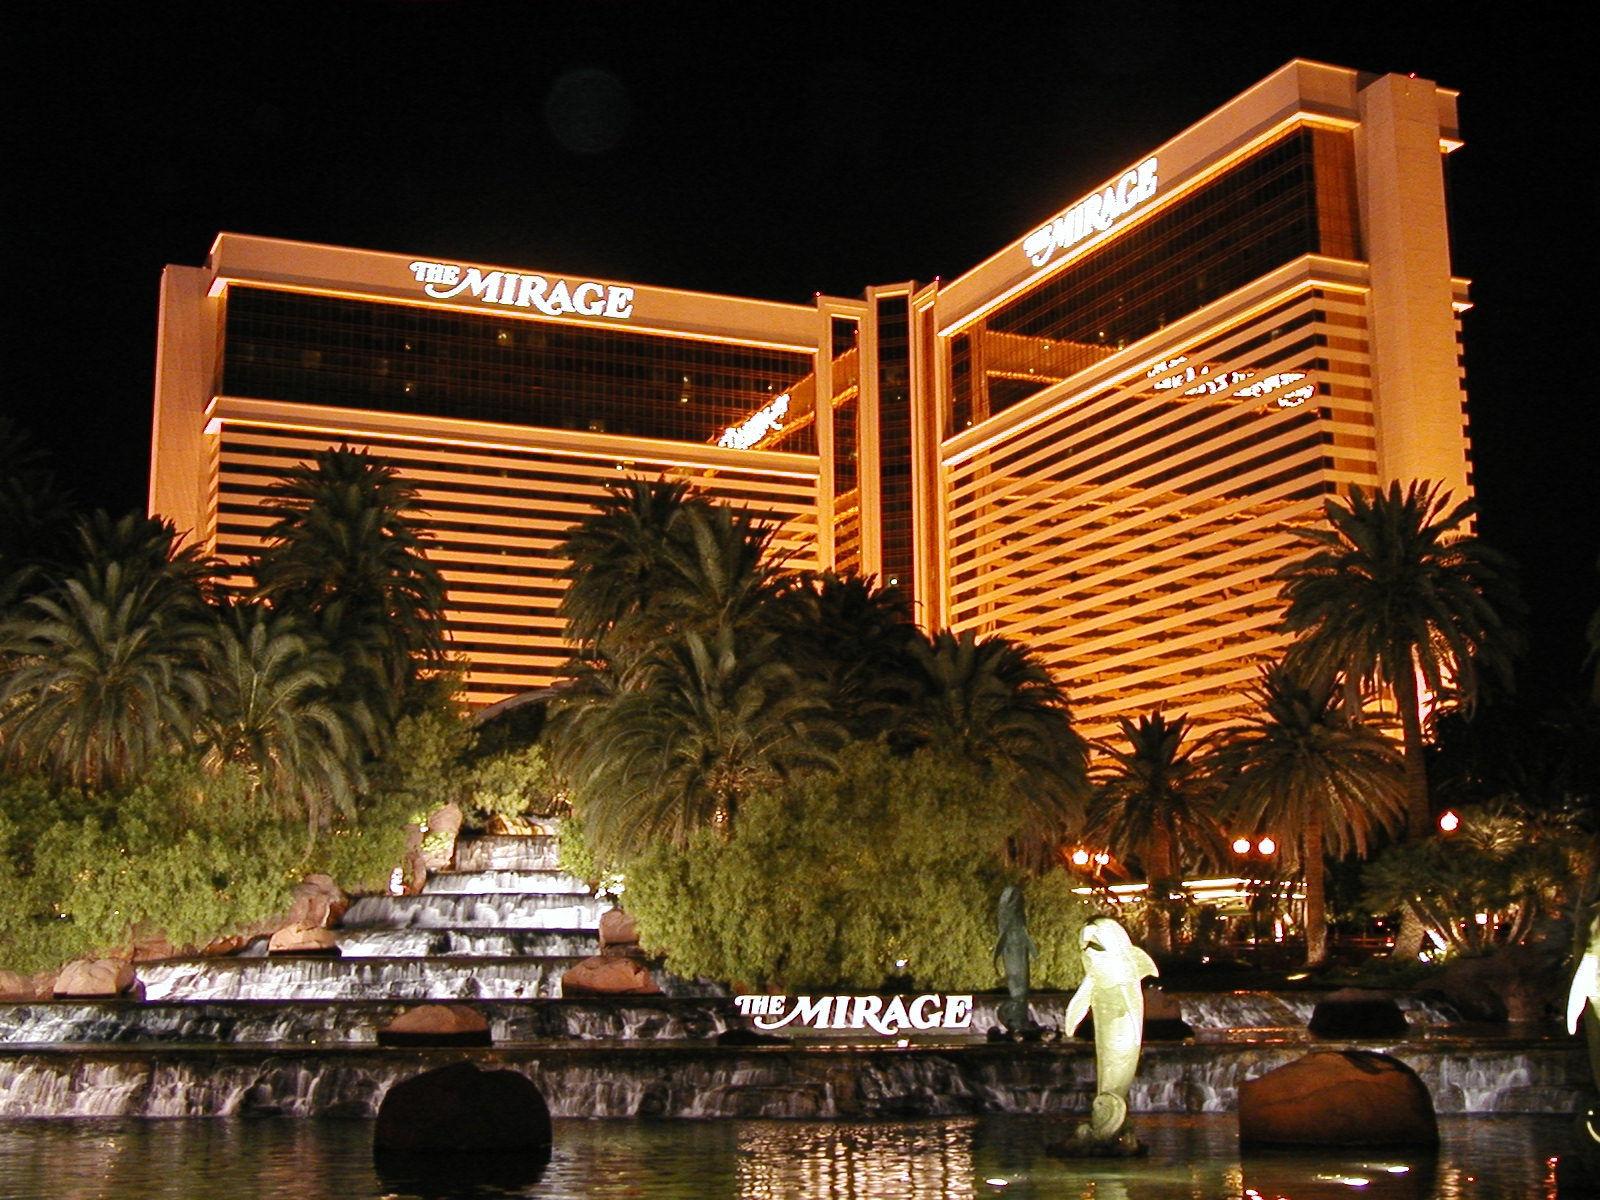 mirage casino vegas